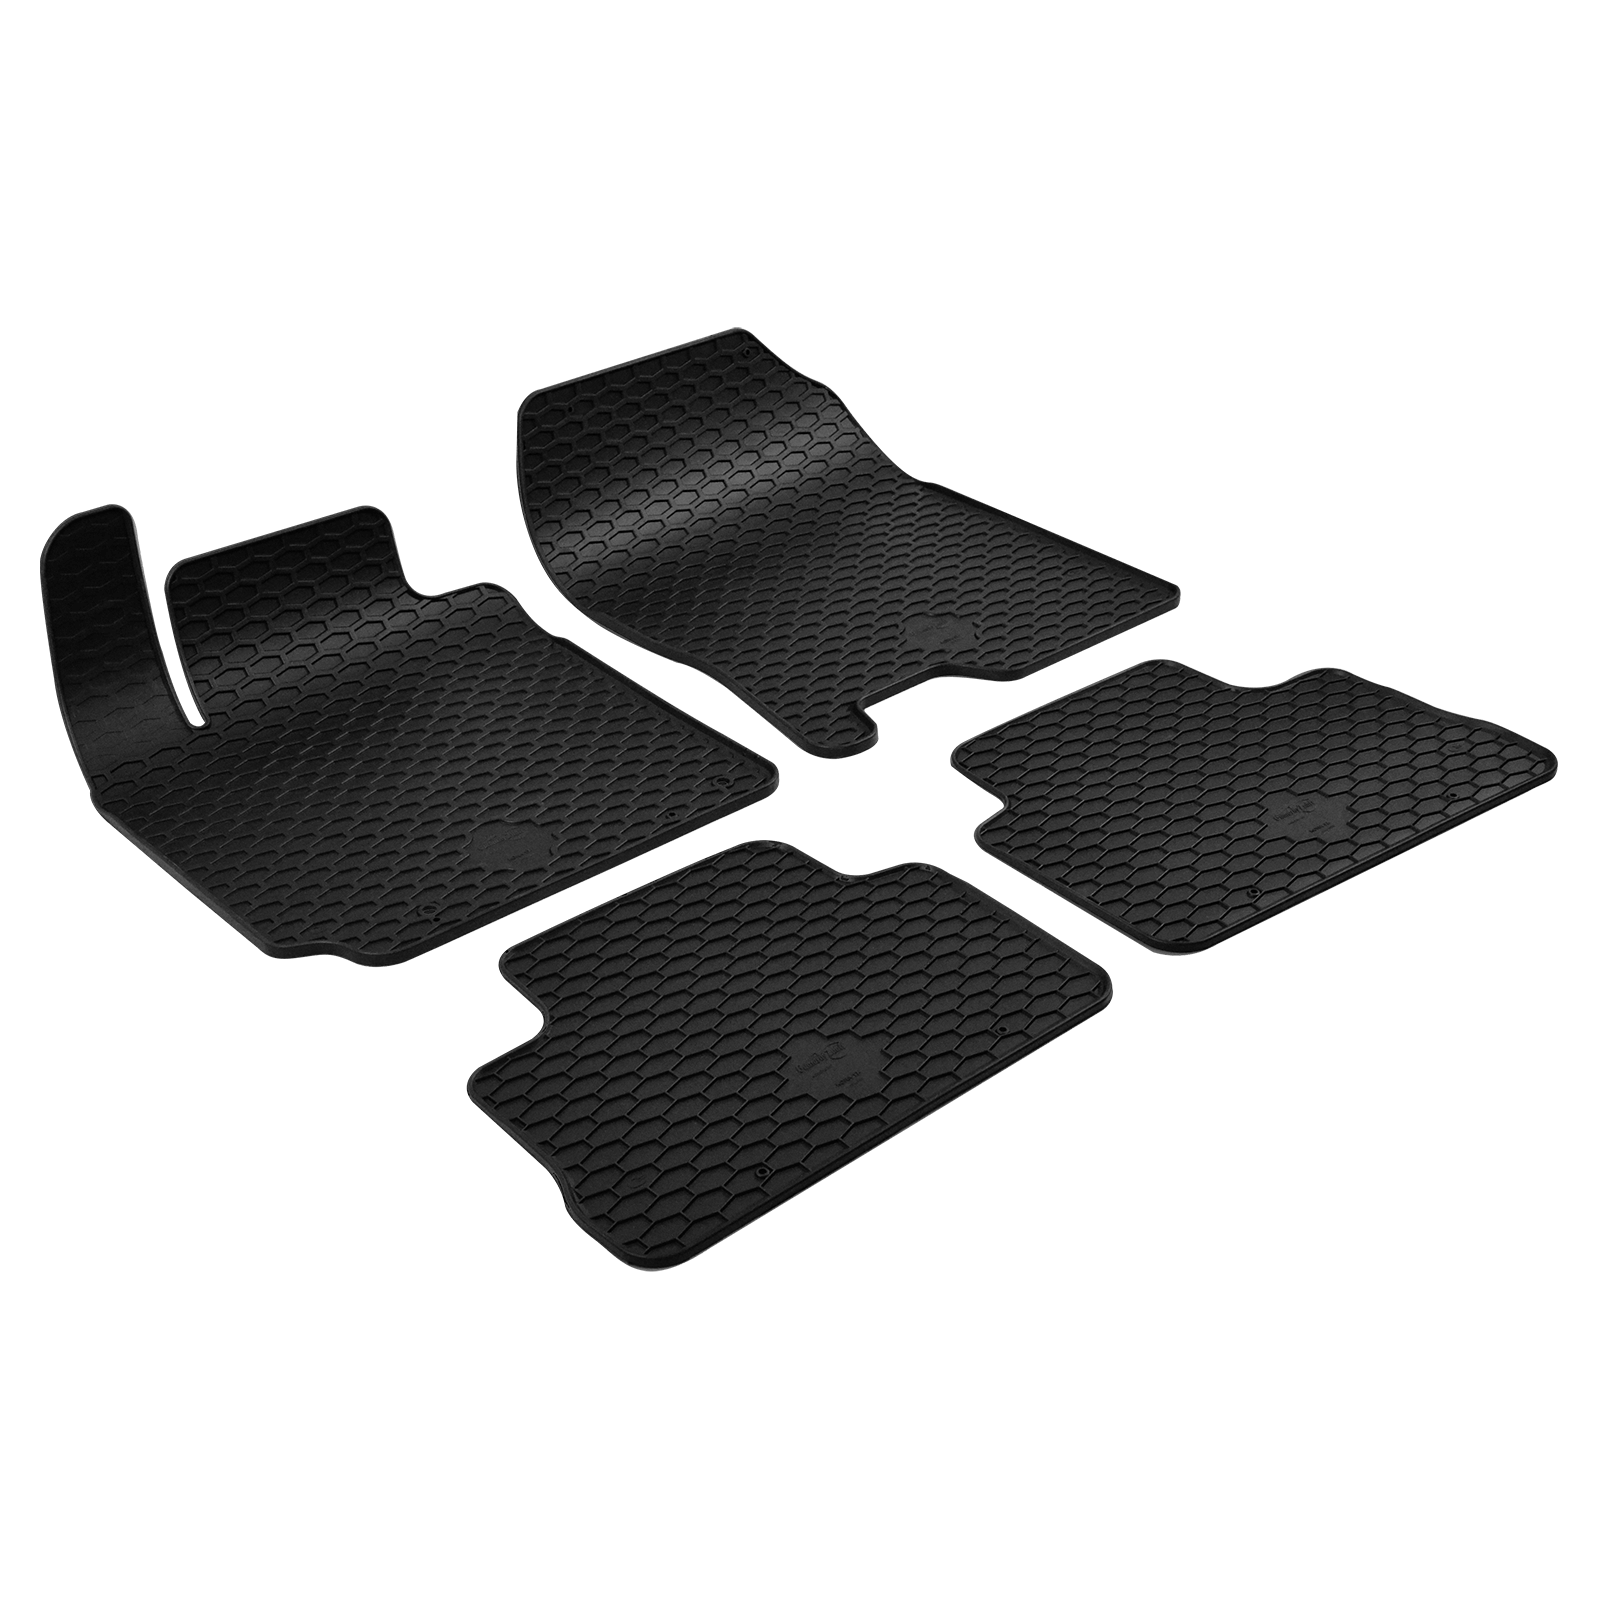 gummi fu matten schwarz f r hyundai kona bj. Black Bedroom Furniture Sets. Home Design Ideas